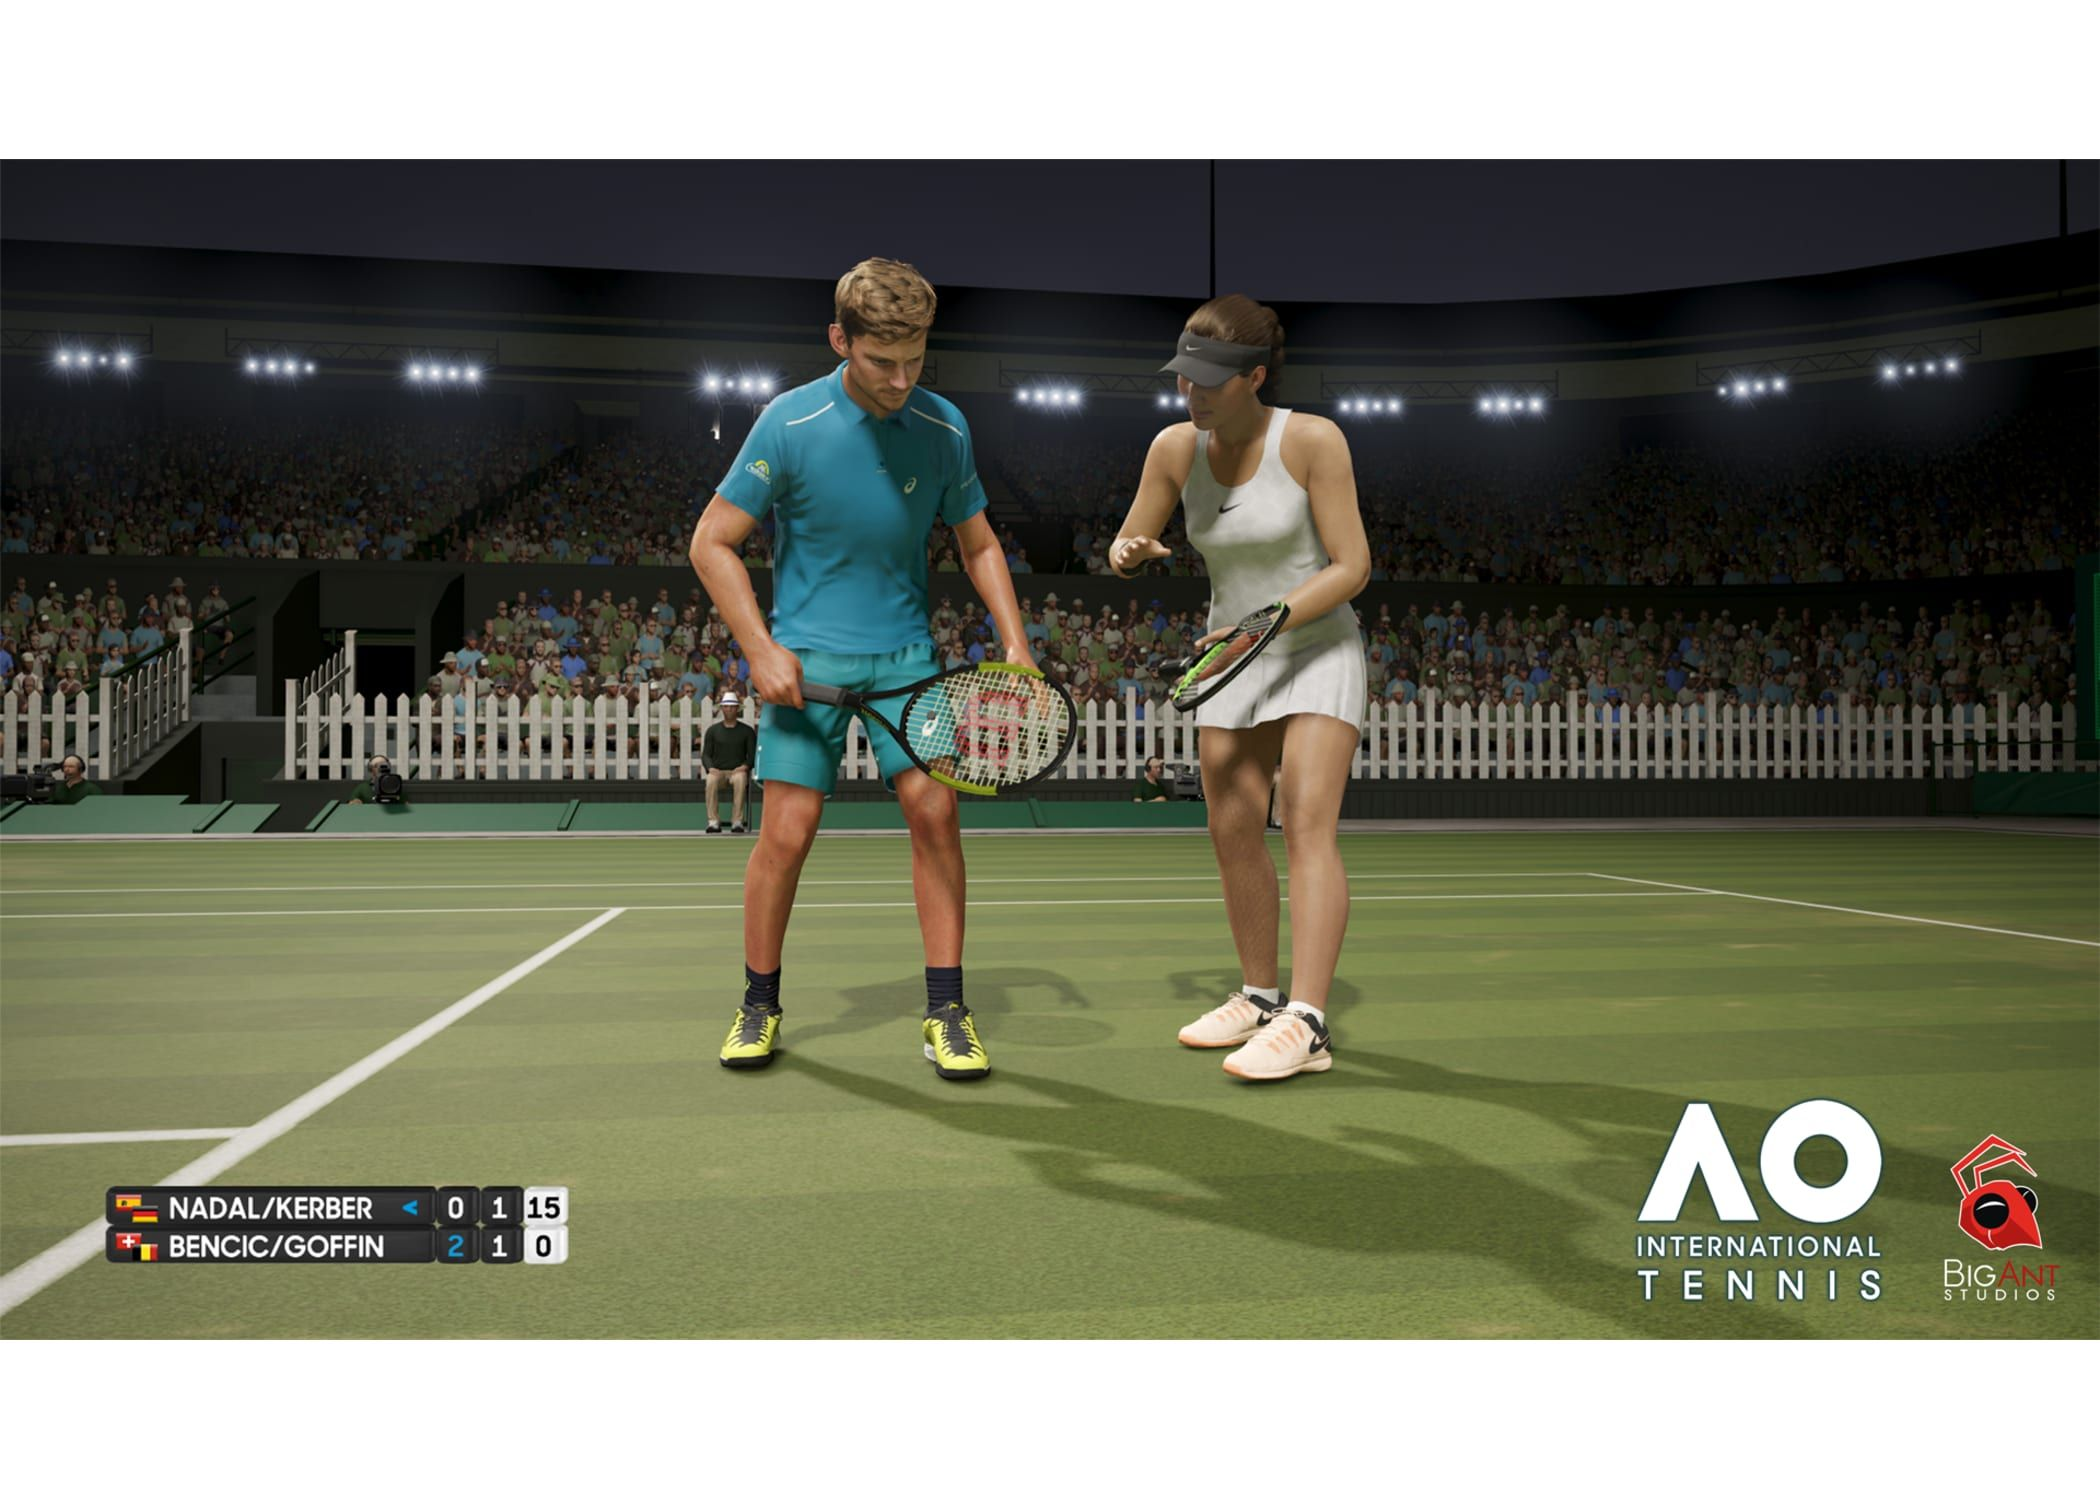 Ao International Tennis In 2020 Tennis Video Game Reviews Tennis Games